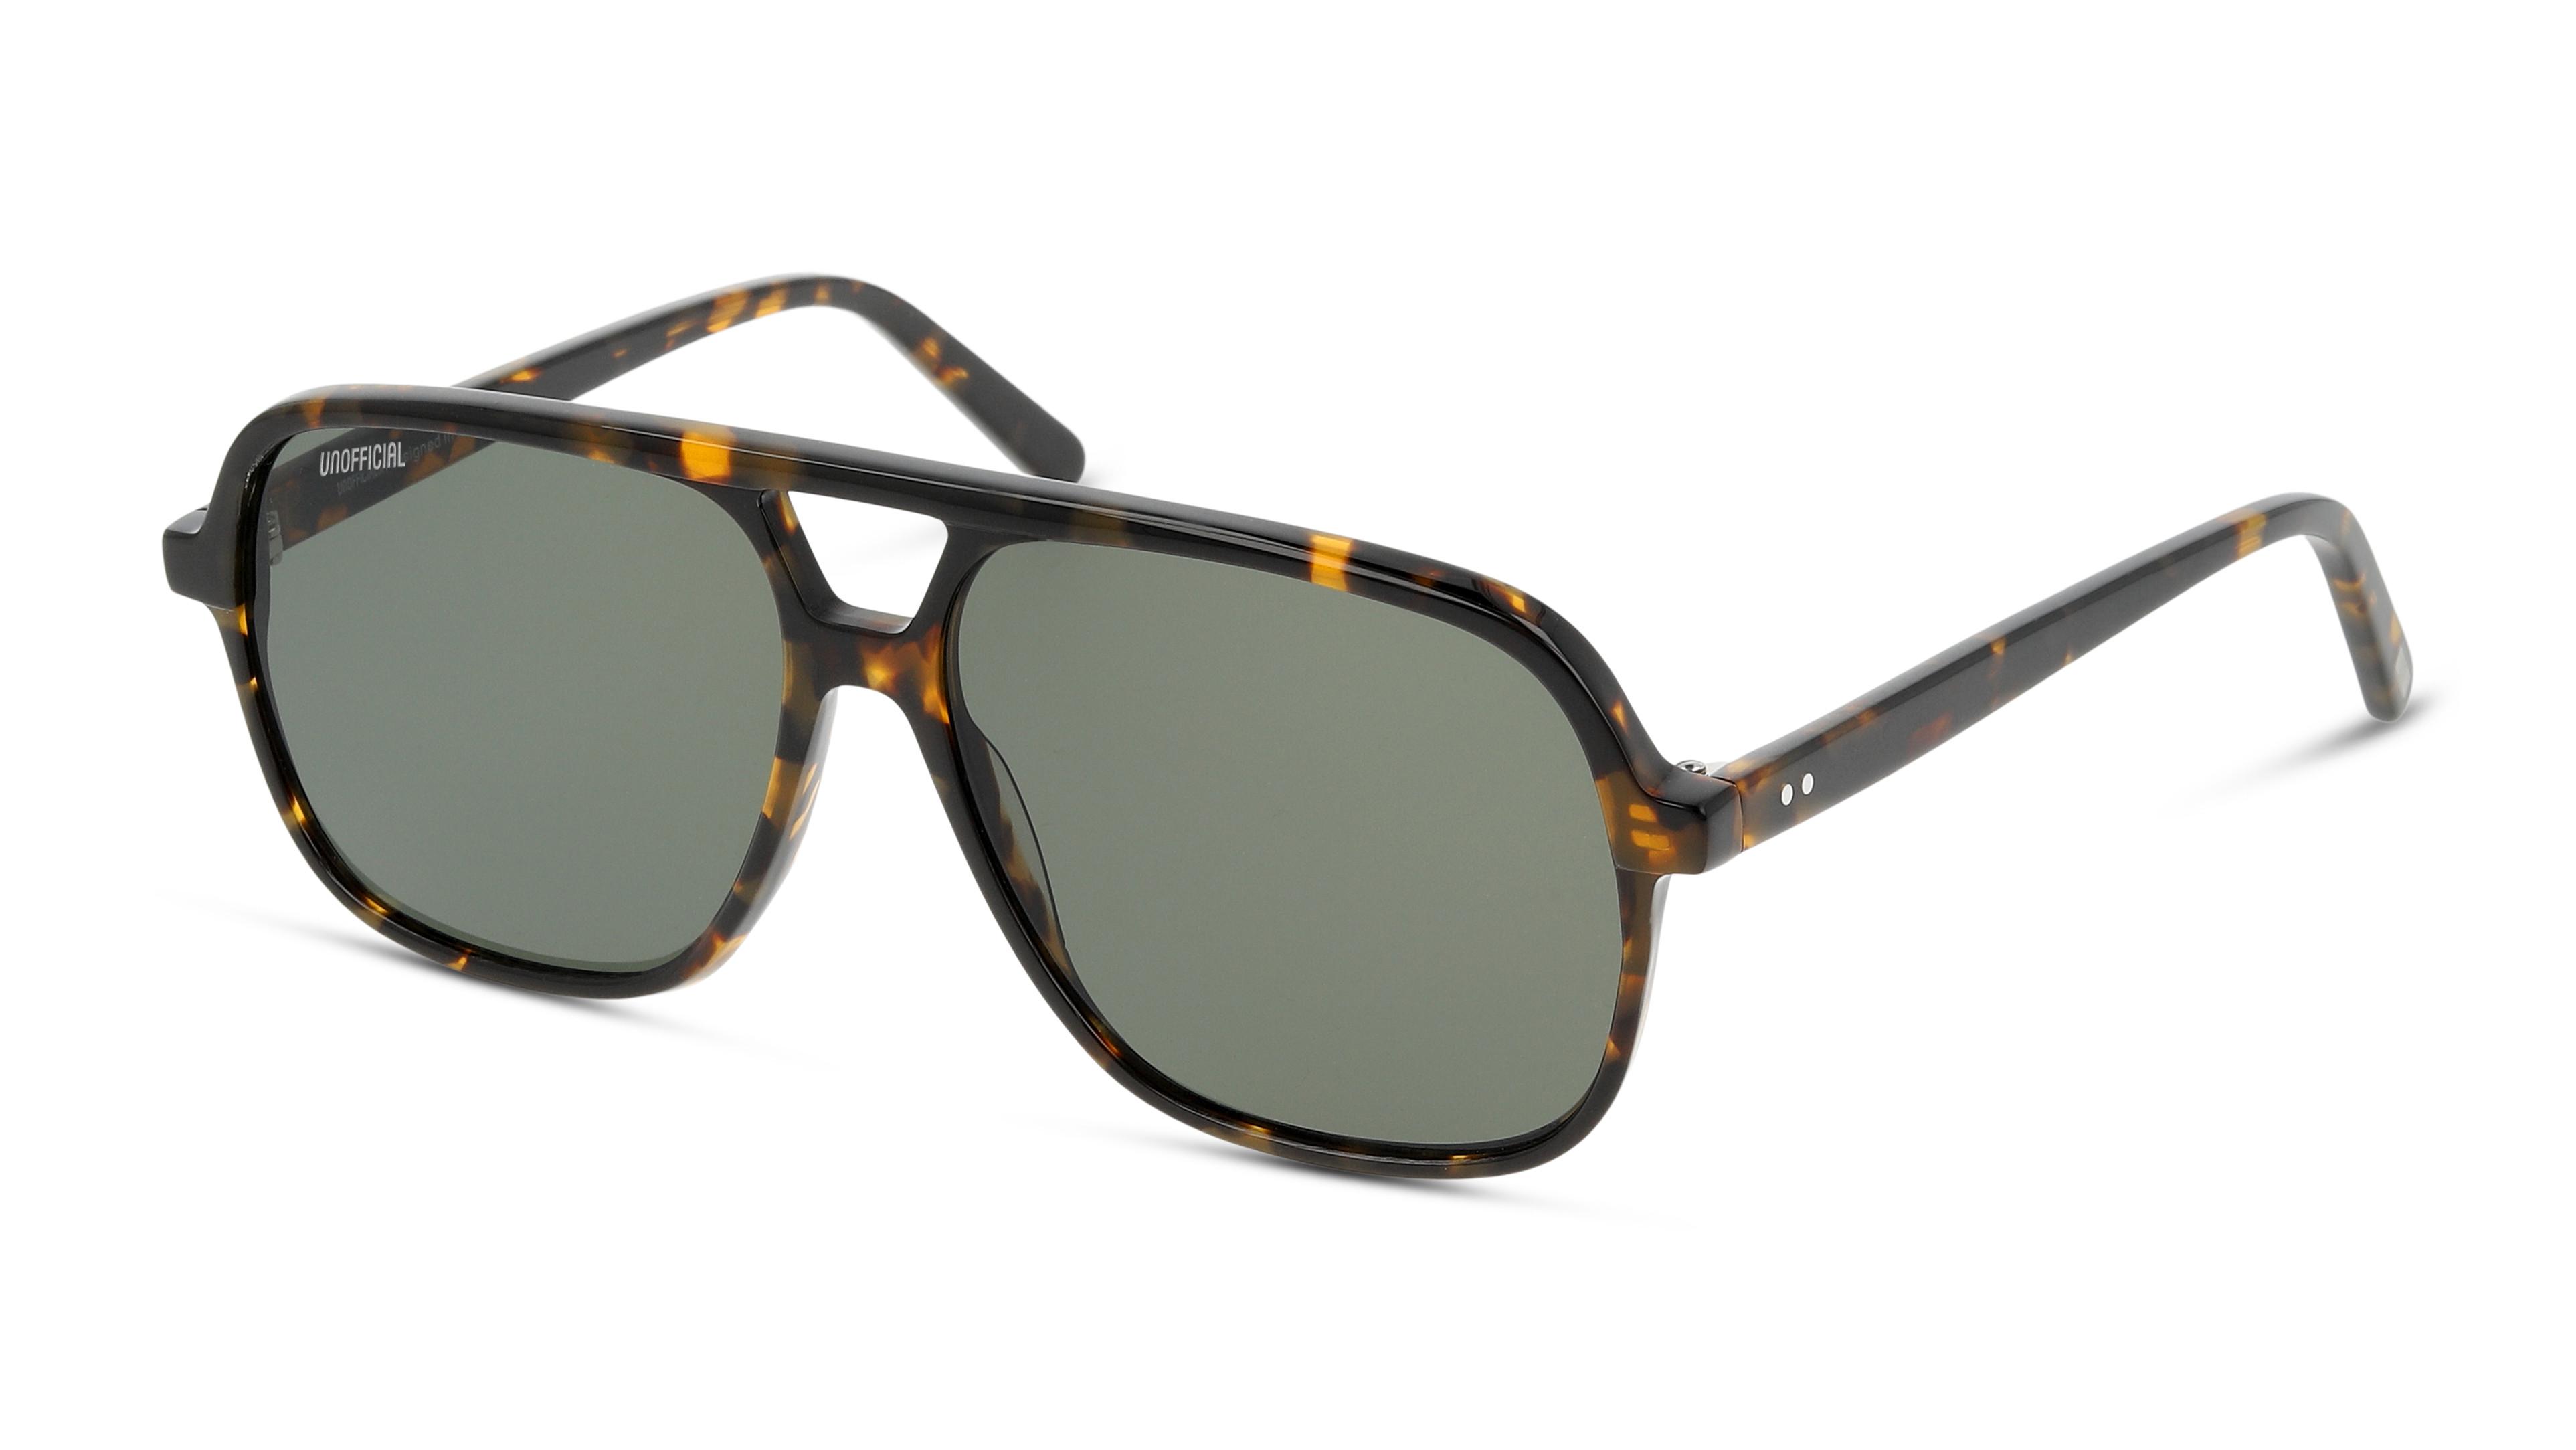 8719154752674-angle-03-unofficial-unsm0014-eyewear-tortoise-tortoise